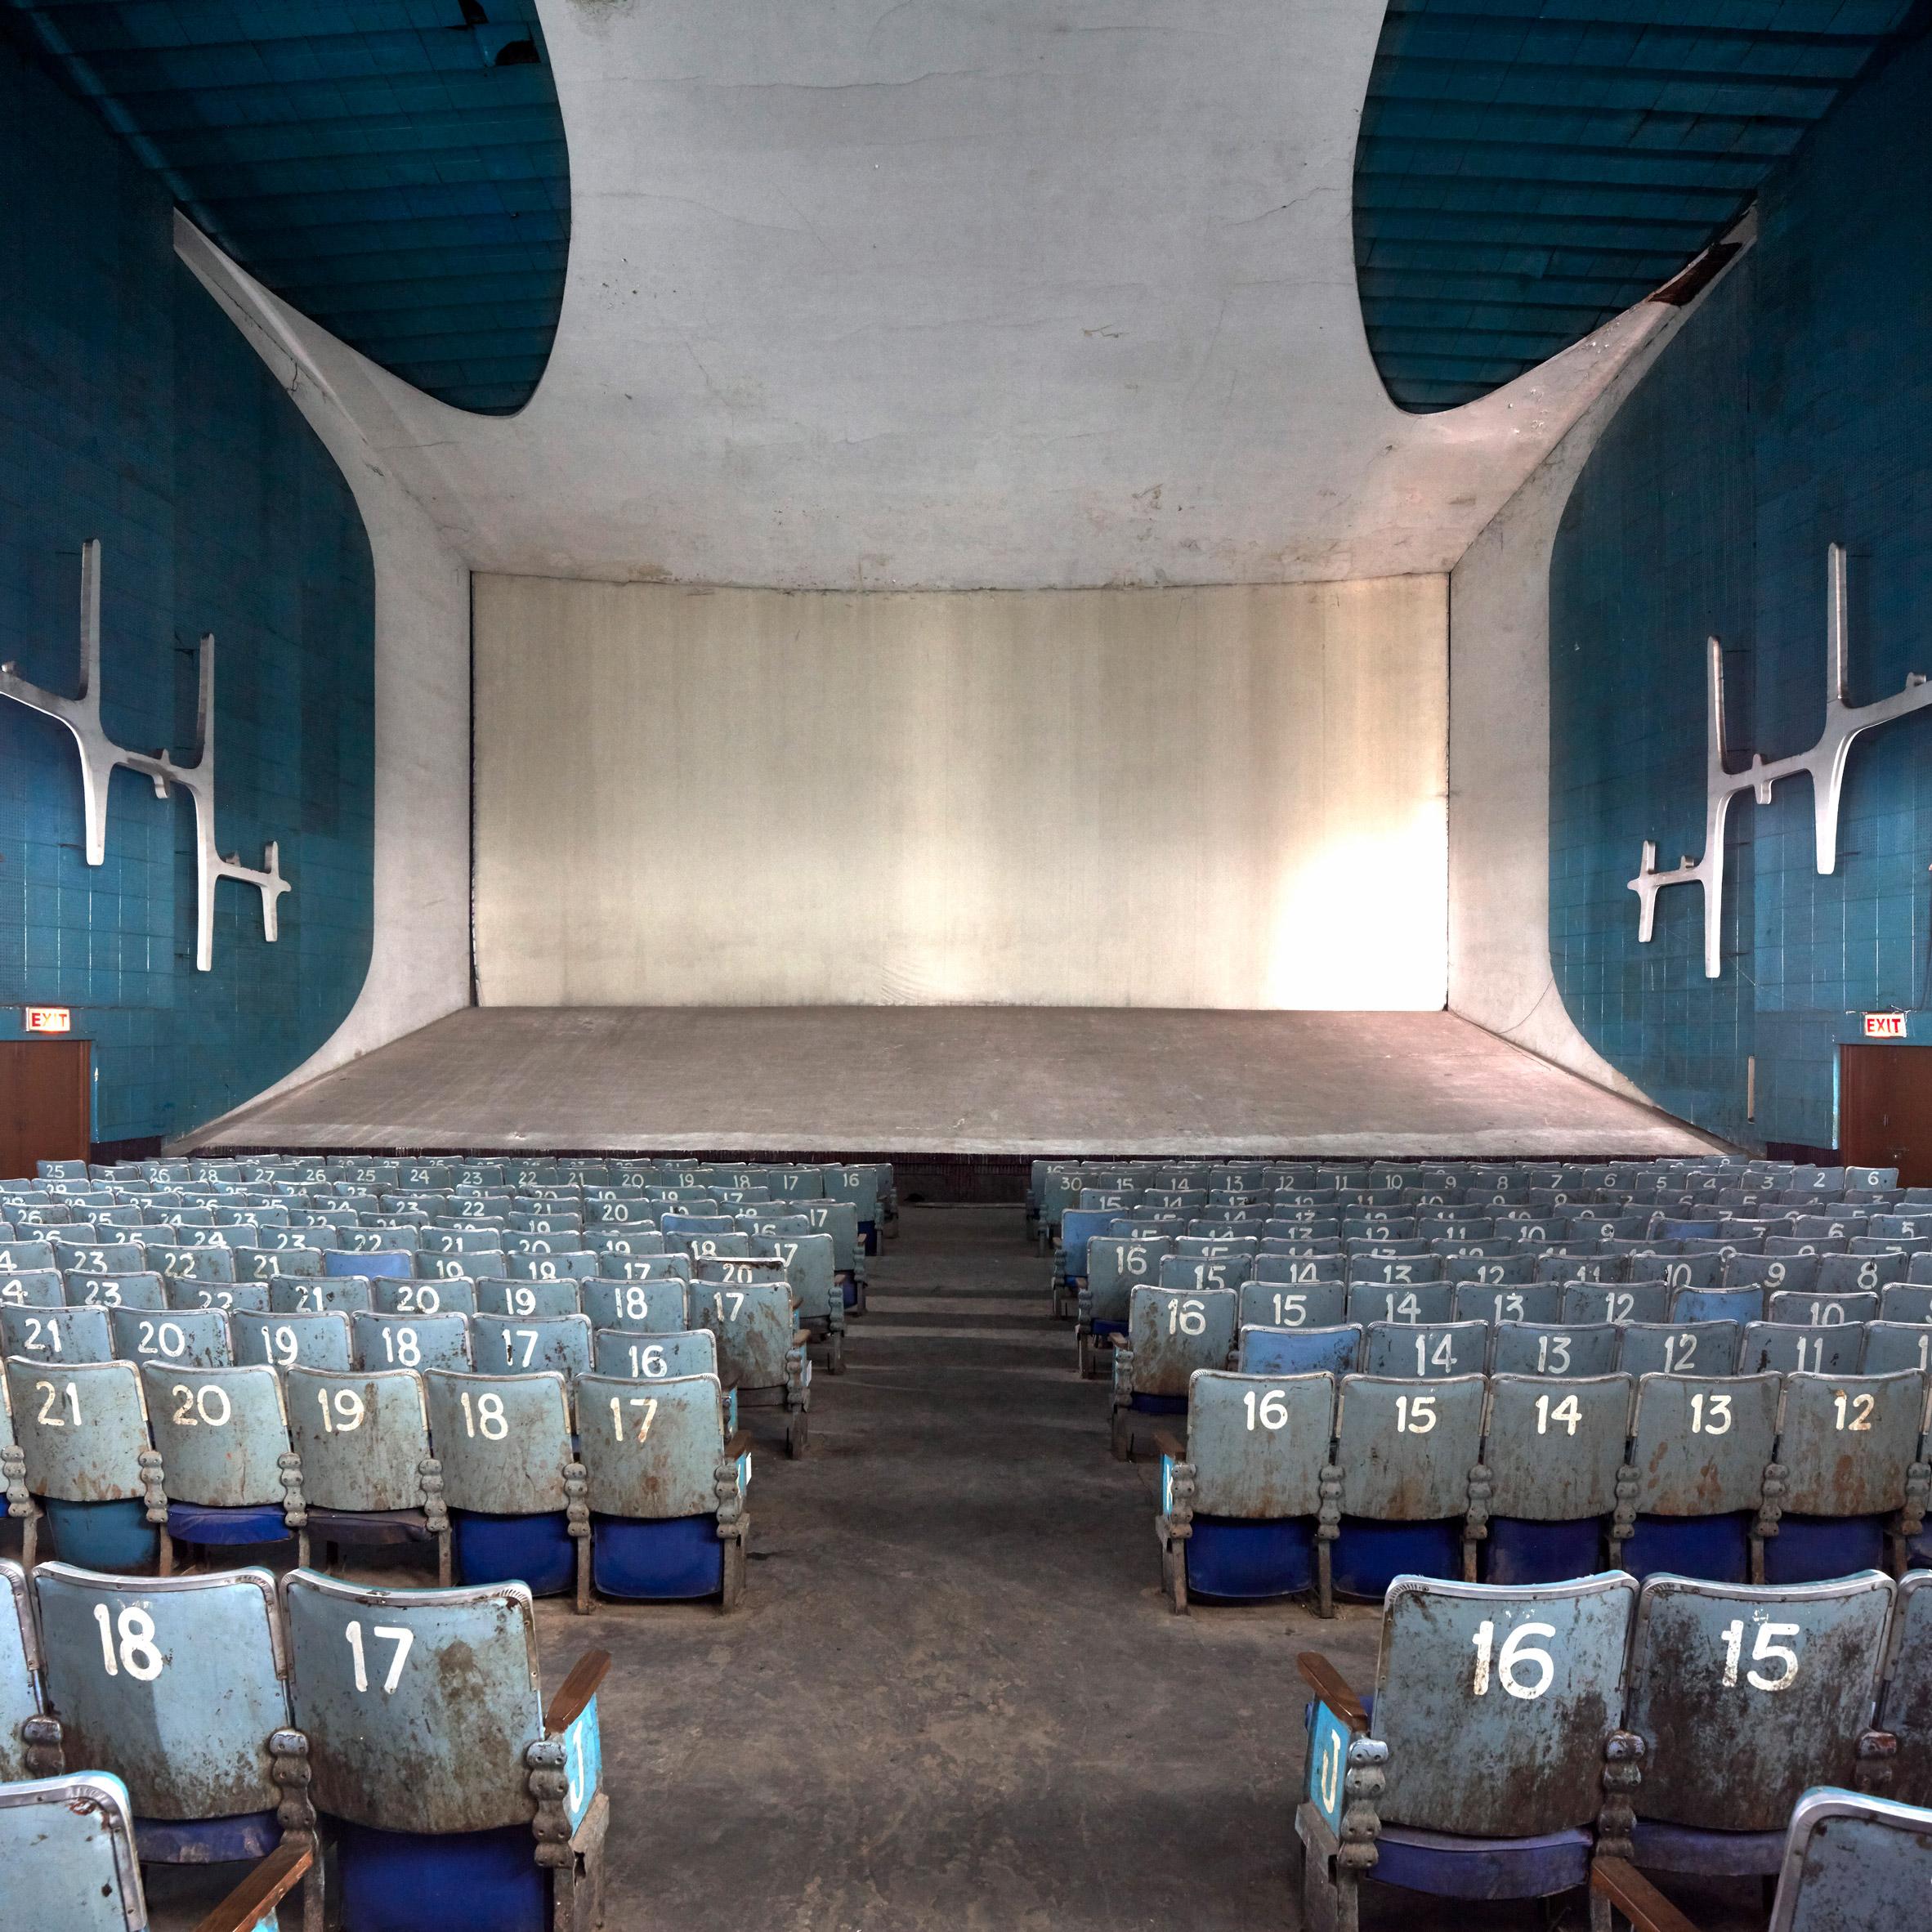 Cinema architecture and interiors Dezeen